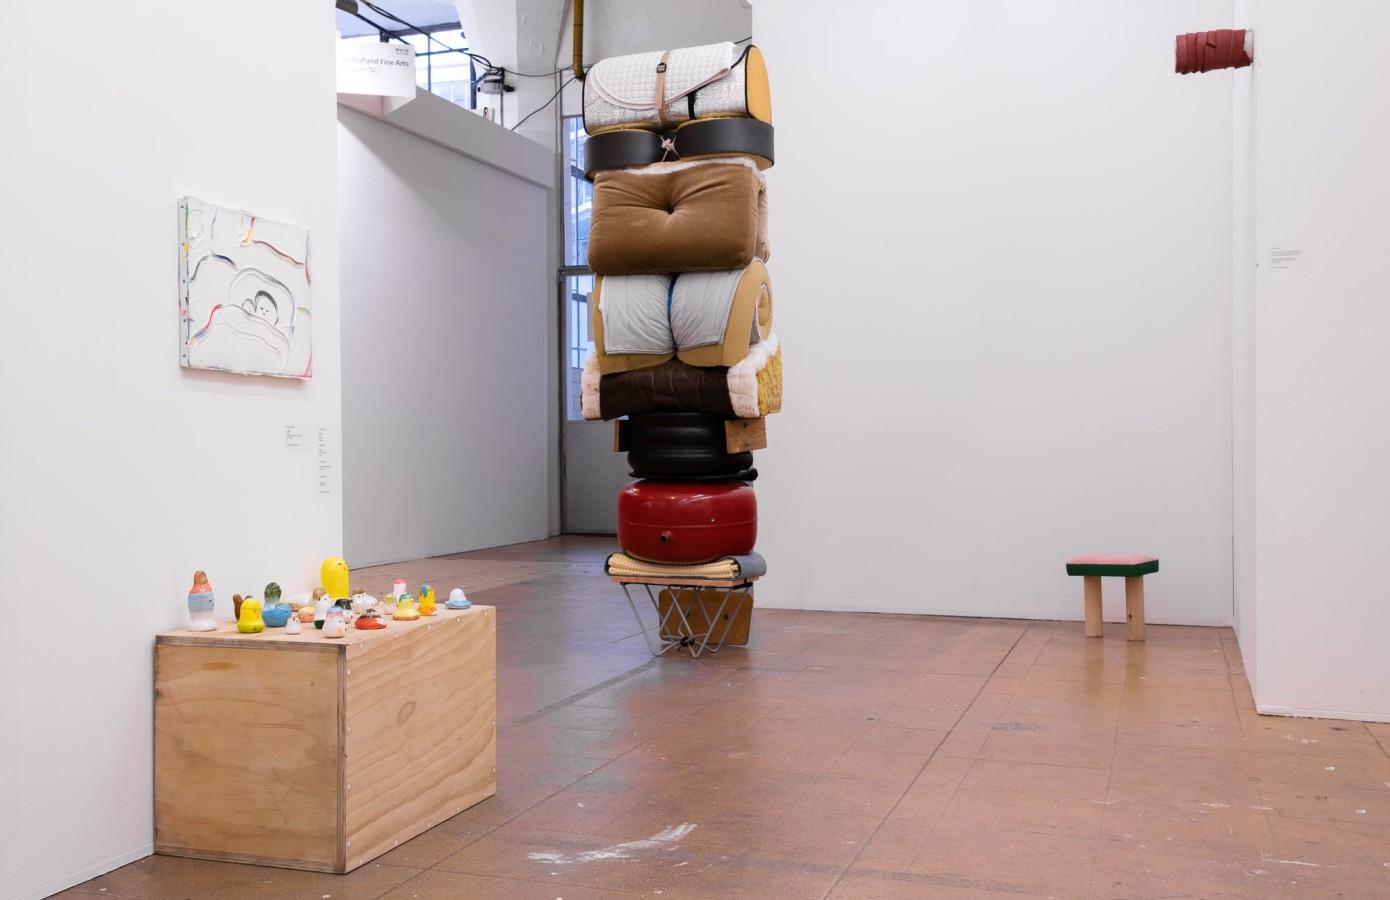 Art Rotterdam 2019, Gino Saccone, Juan Pablo Plazas, Kenichi Ogawa, Kurt Ryslavy, Suchan Kinoshita, Wobbe Micha, Yuki Okumura,